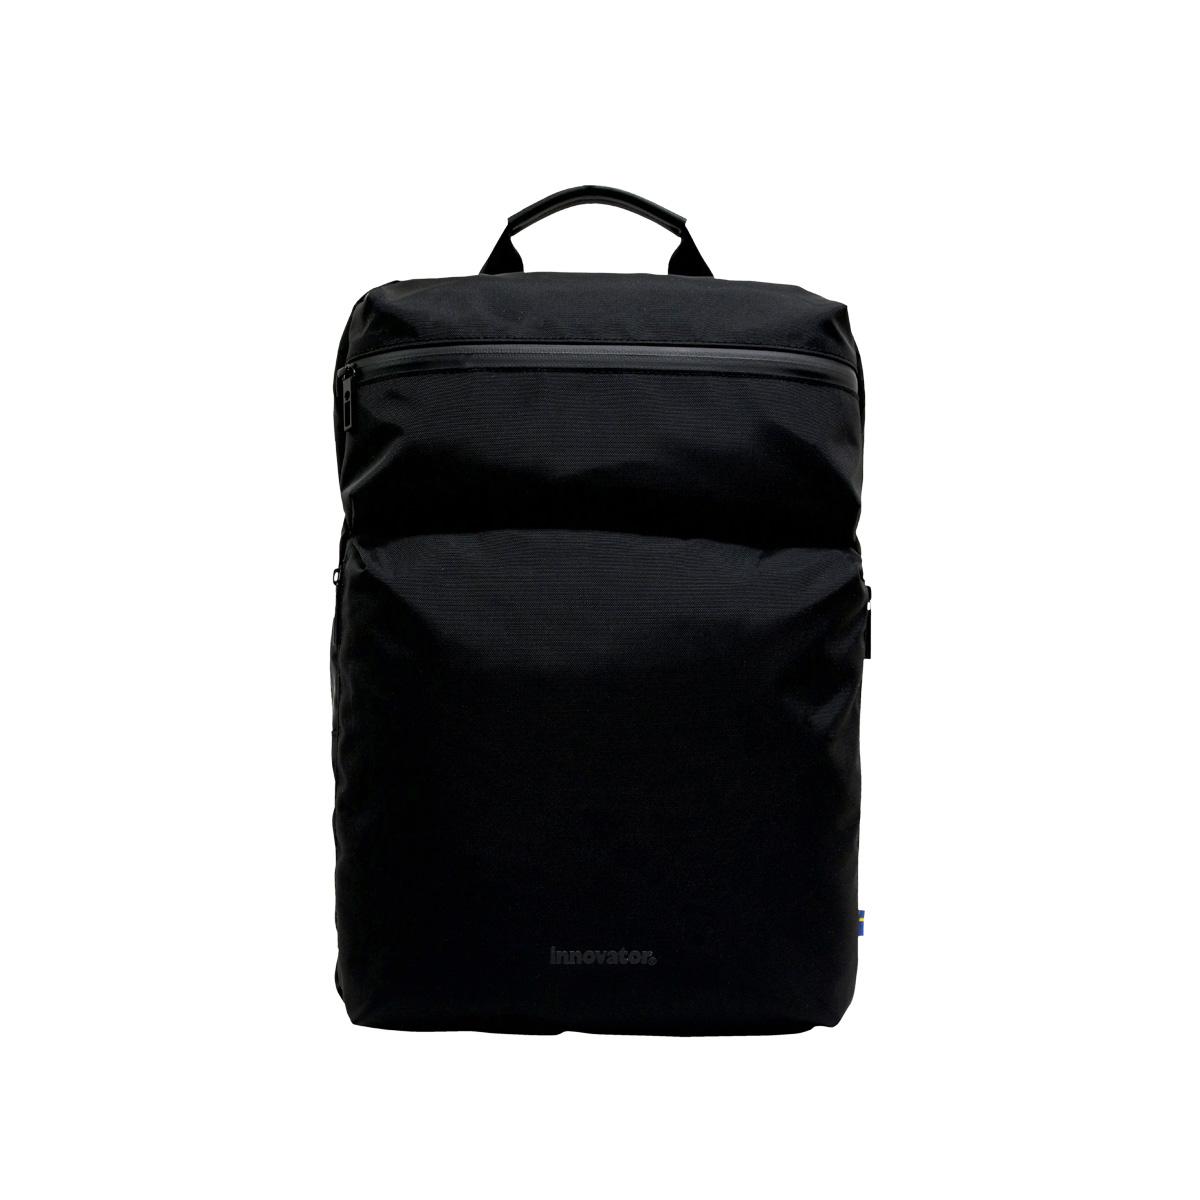 innovator BACK PACK イノベーター リュック バッグ バックパック メンズ 13.7L 撥水 ブラック グレー ネイビー 黒 INB-004 [7/31 追加入荷]